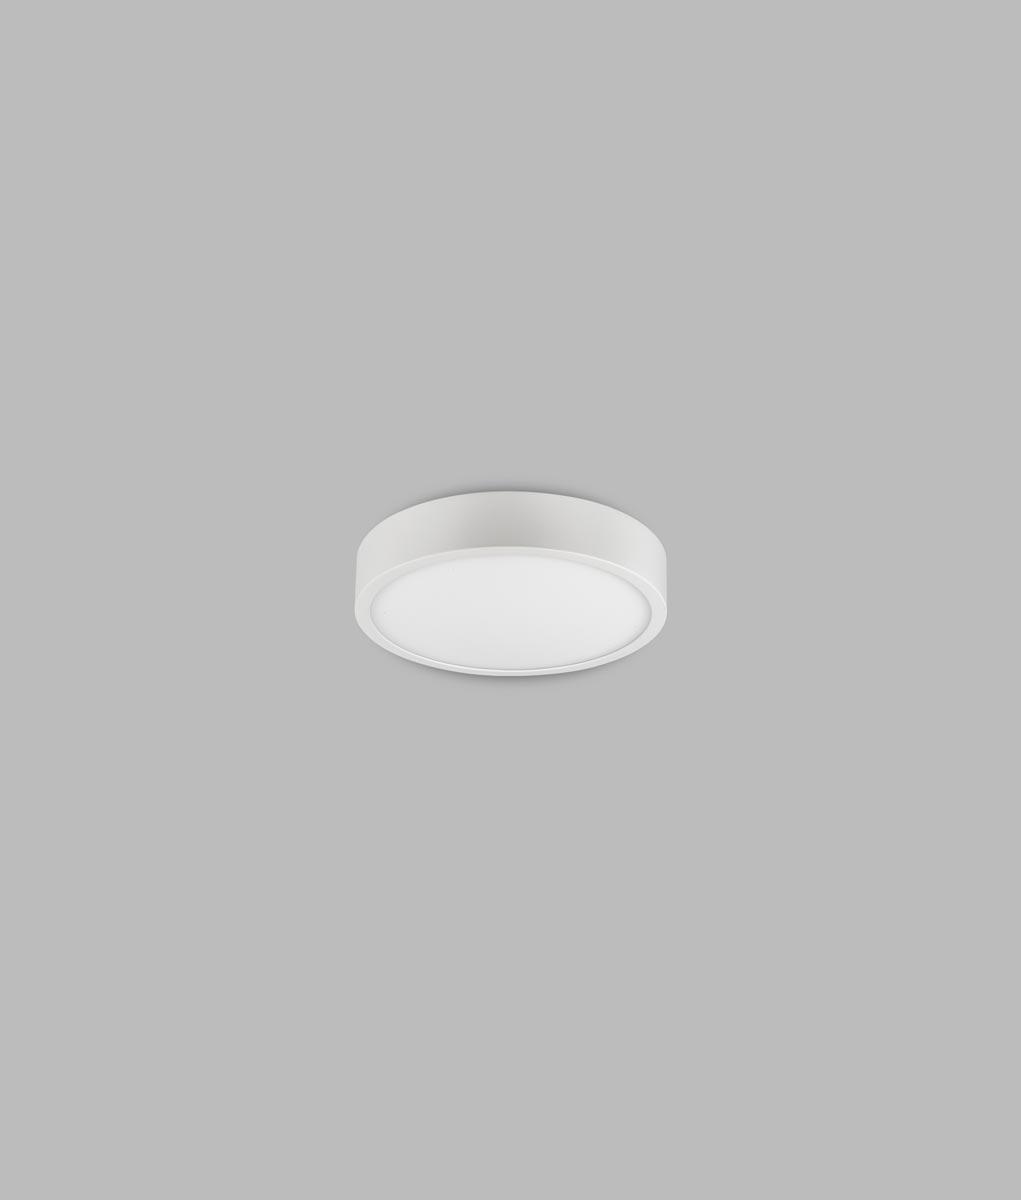 Plafón superficie 12 cm Ø luz neutra 8W SAONA